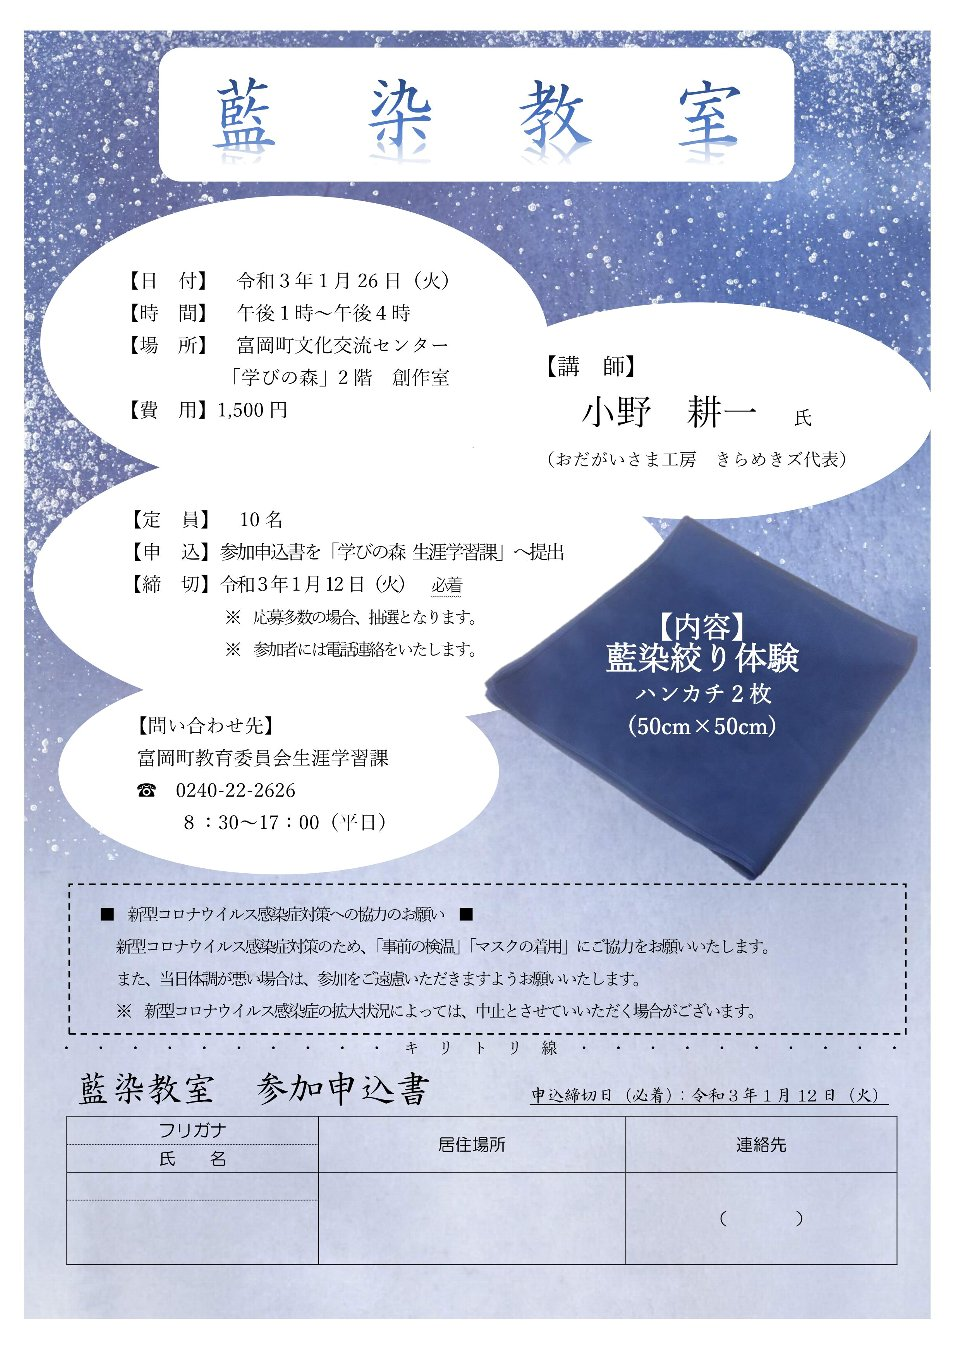 ※開催延期【富岡町】藍染教室 @ 富岡町文化交流センター「学びの森」2階 創作室